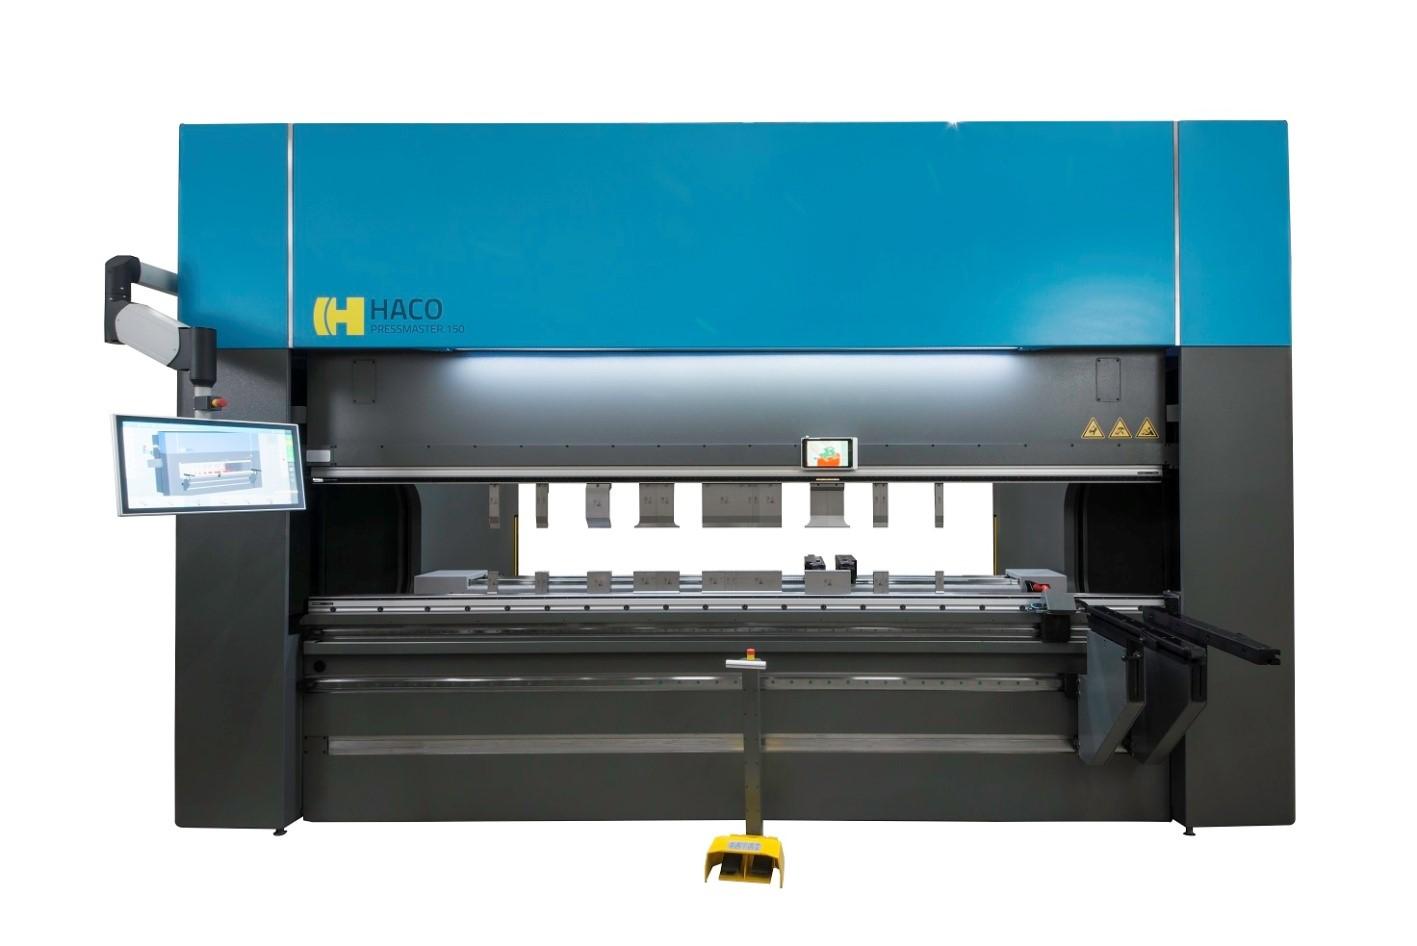 Haco 10\' x 165 Ton Multi-Axis Hydraulic CNC Press Brake with ...